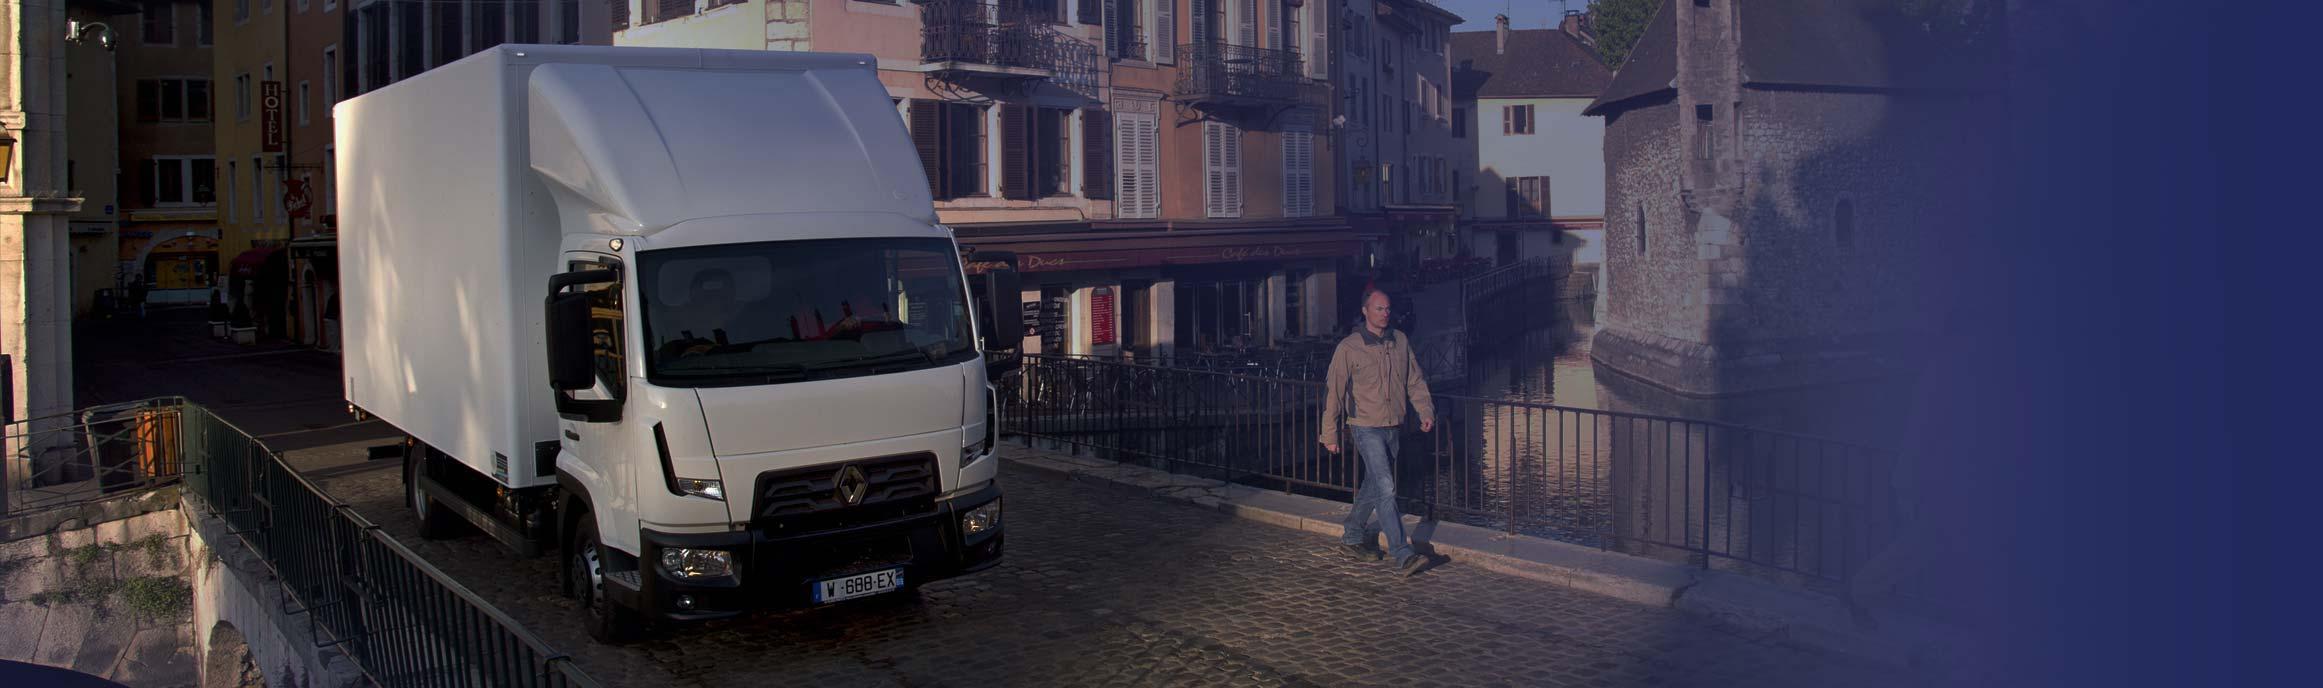 Renault D Trucks bij BAS Truck Center